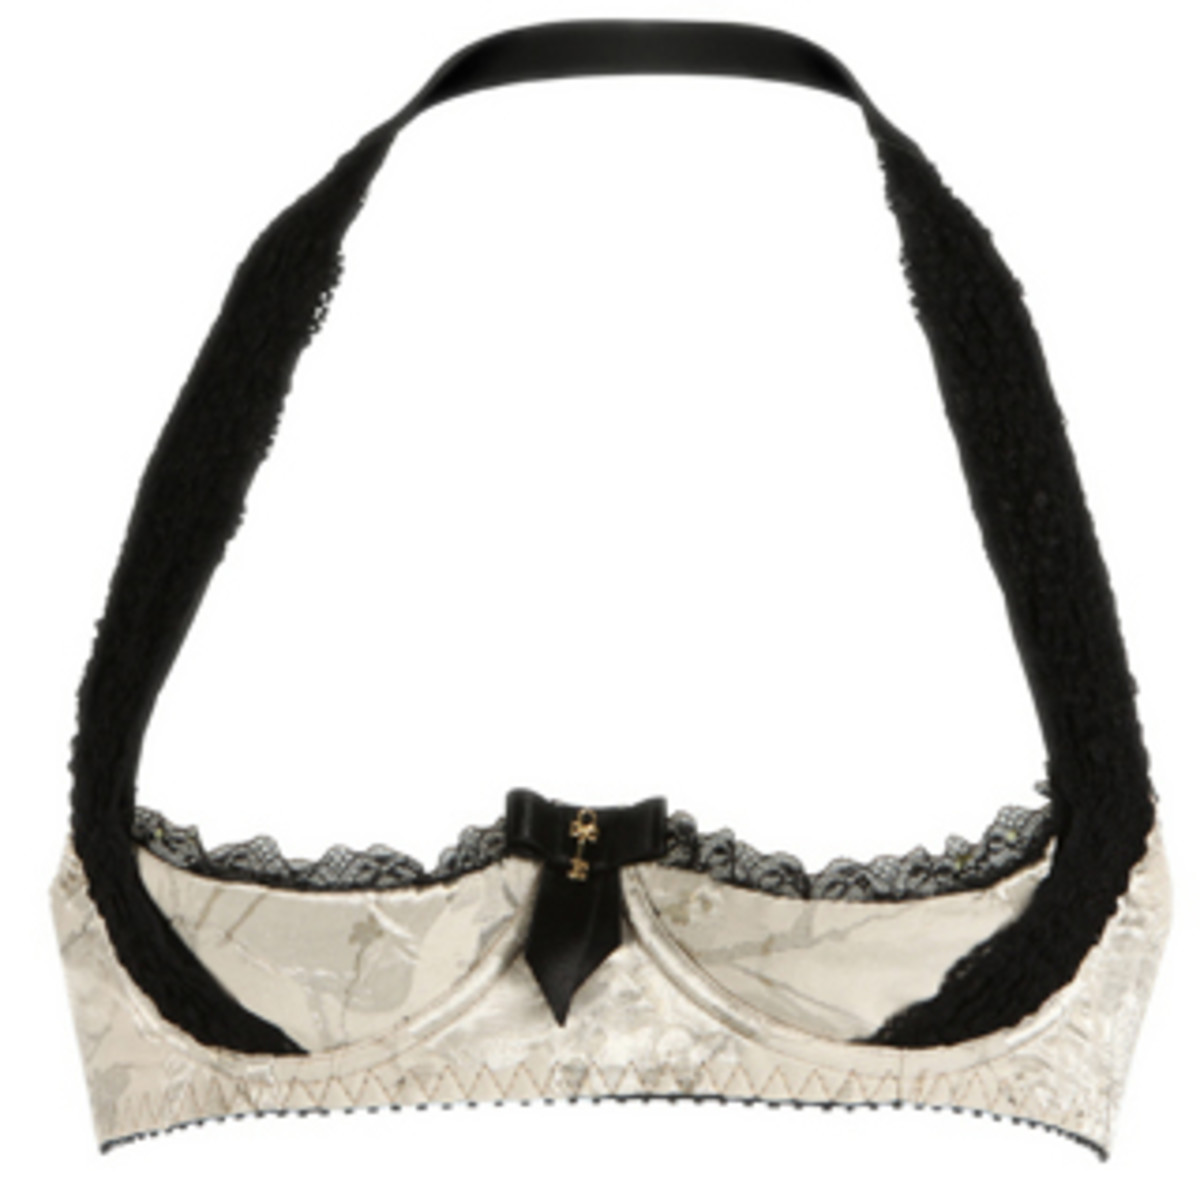 shelf bra from Sarah